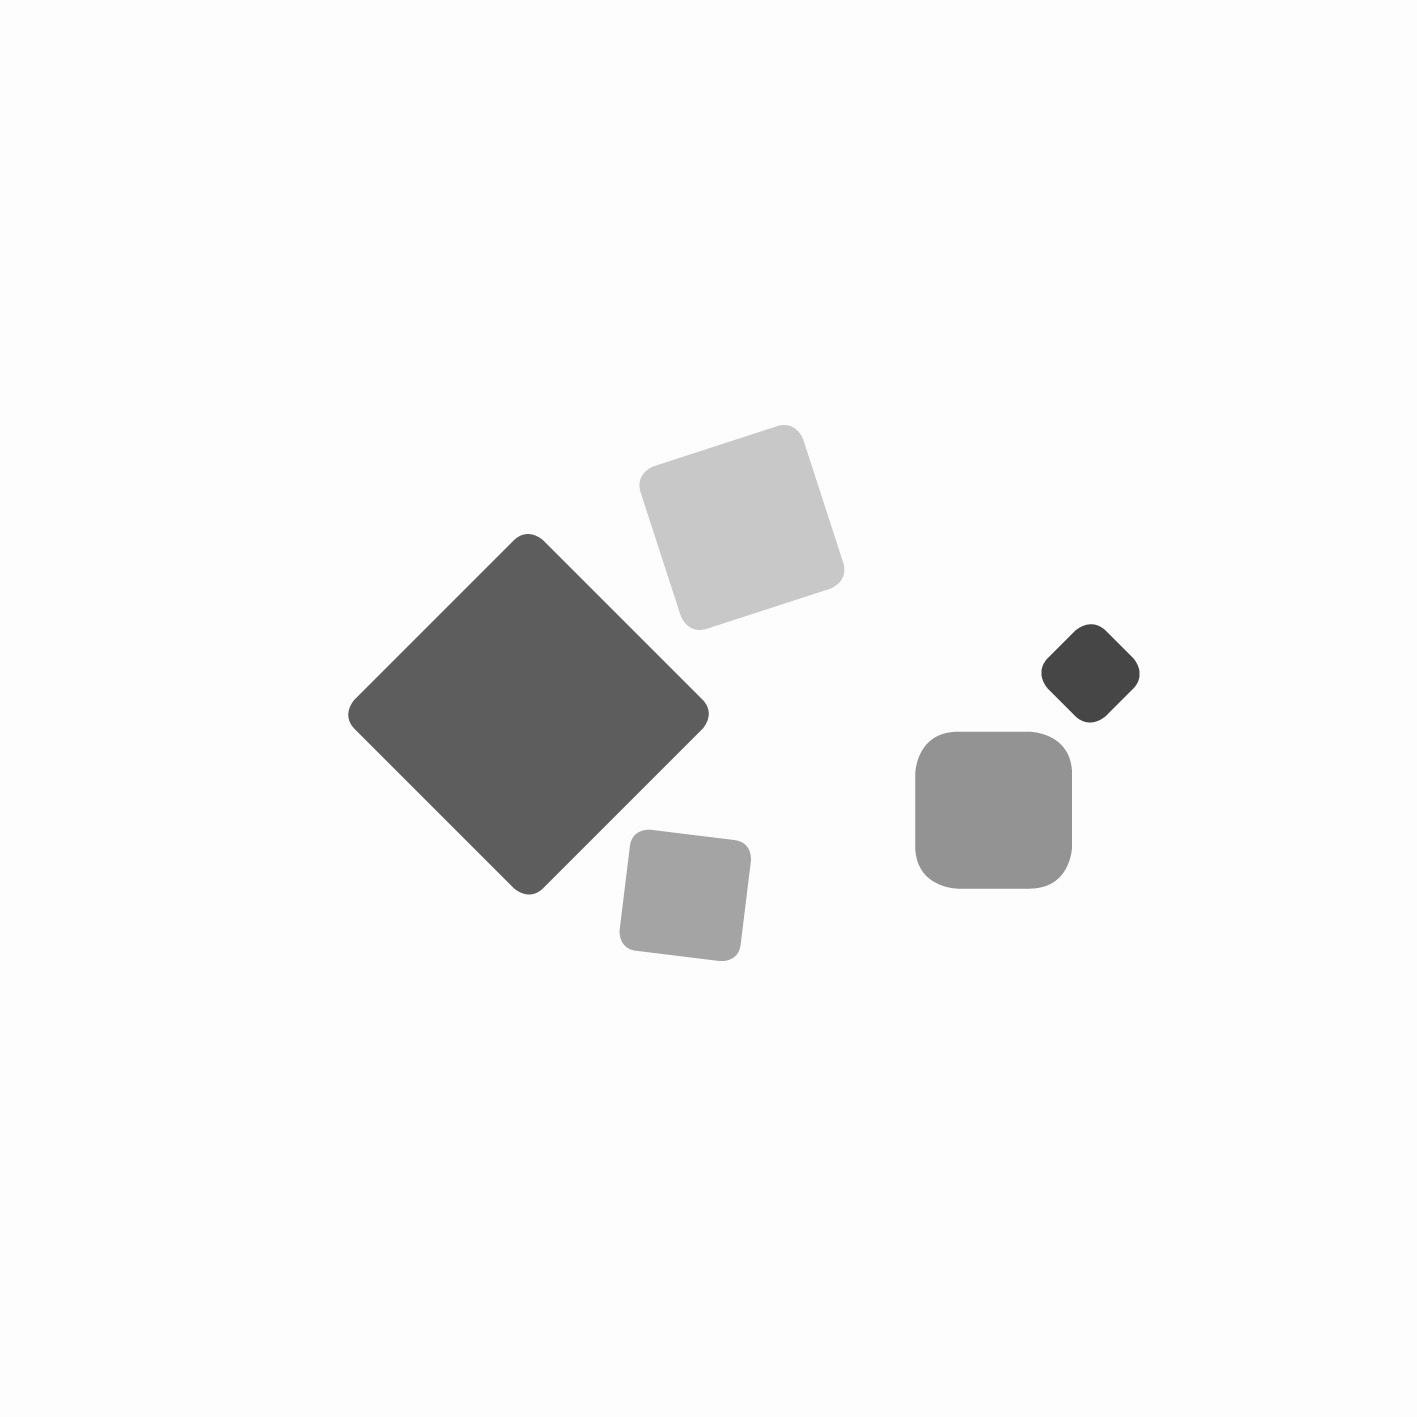 Logo_Wuerfelchen_grau